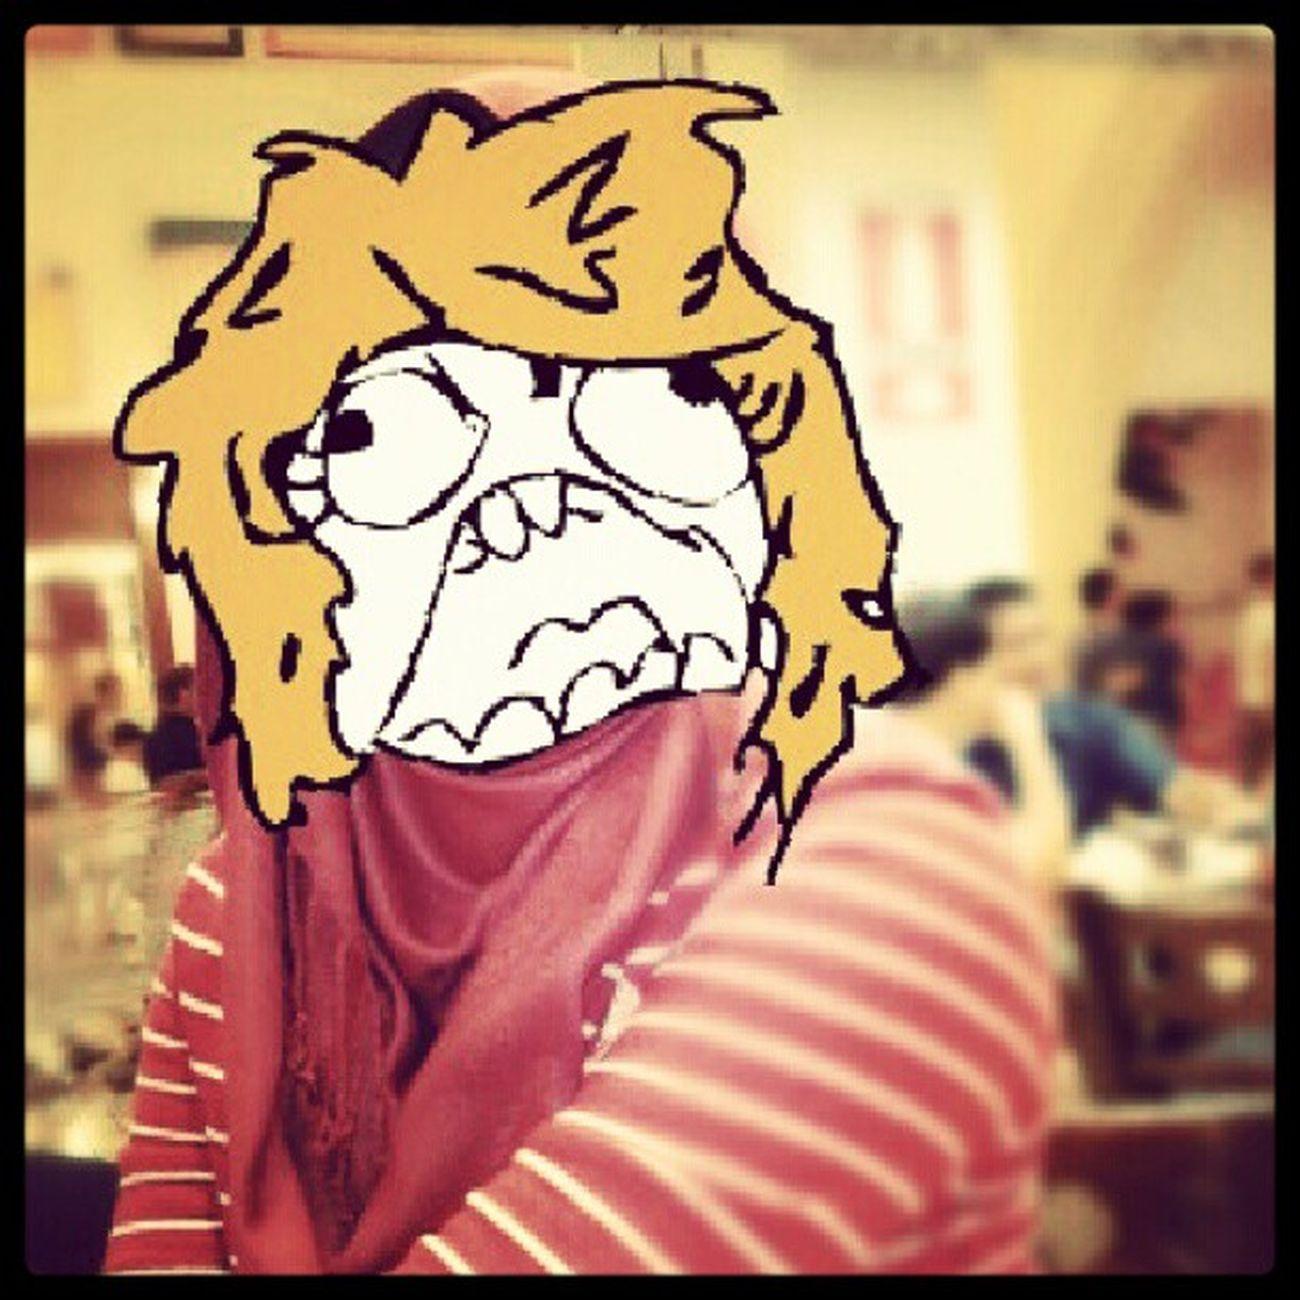 Tolong la Curier ikan bilis kat saya kat Qatar nih!!!Gahhh gahhhhh!!! Rageface @maszlavista